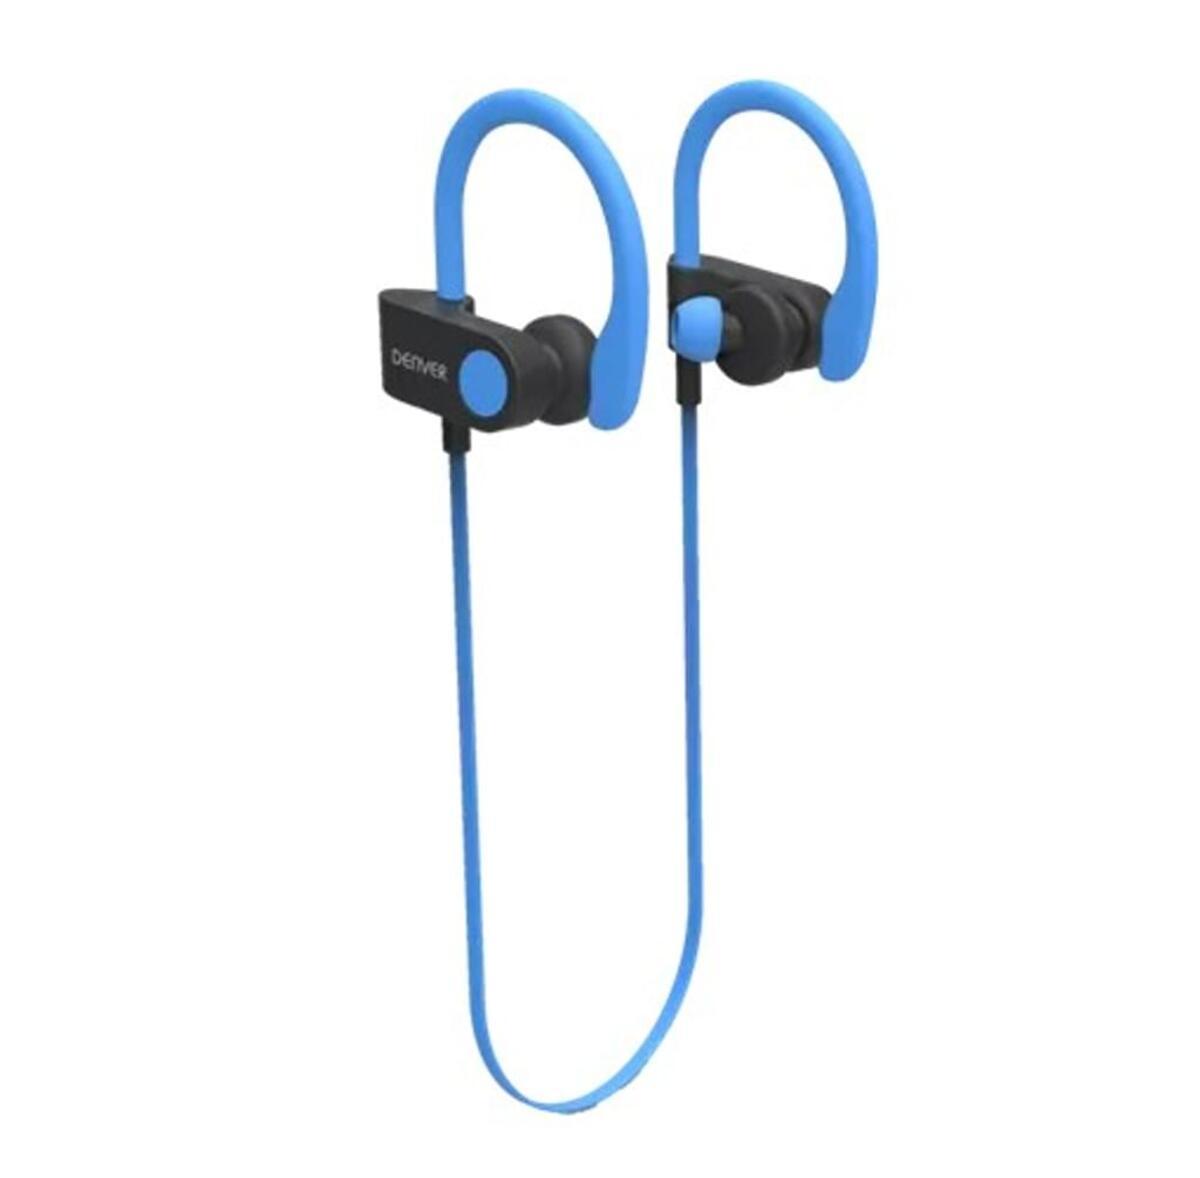 Bild 2 von Bluetooth Kopfhörer Sport Denver Electronics BTE-110 50 mAh